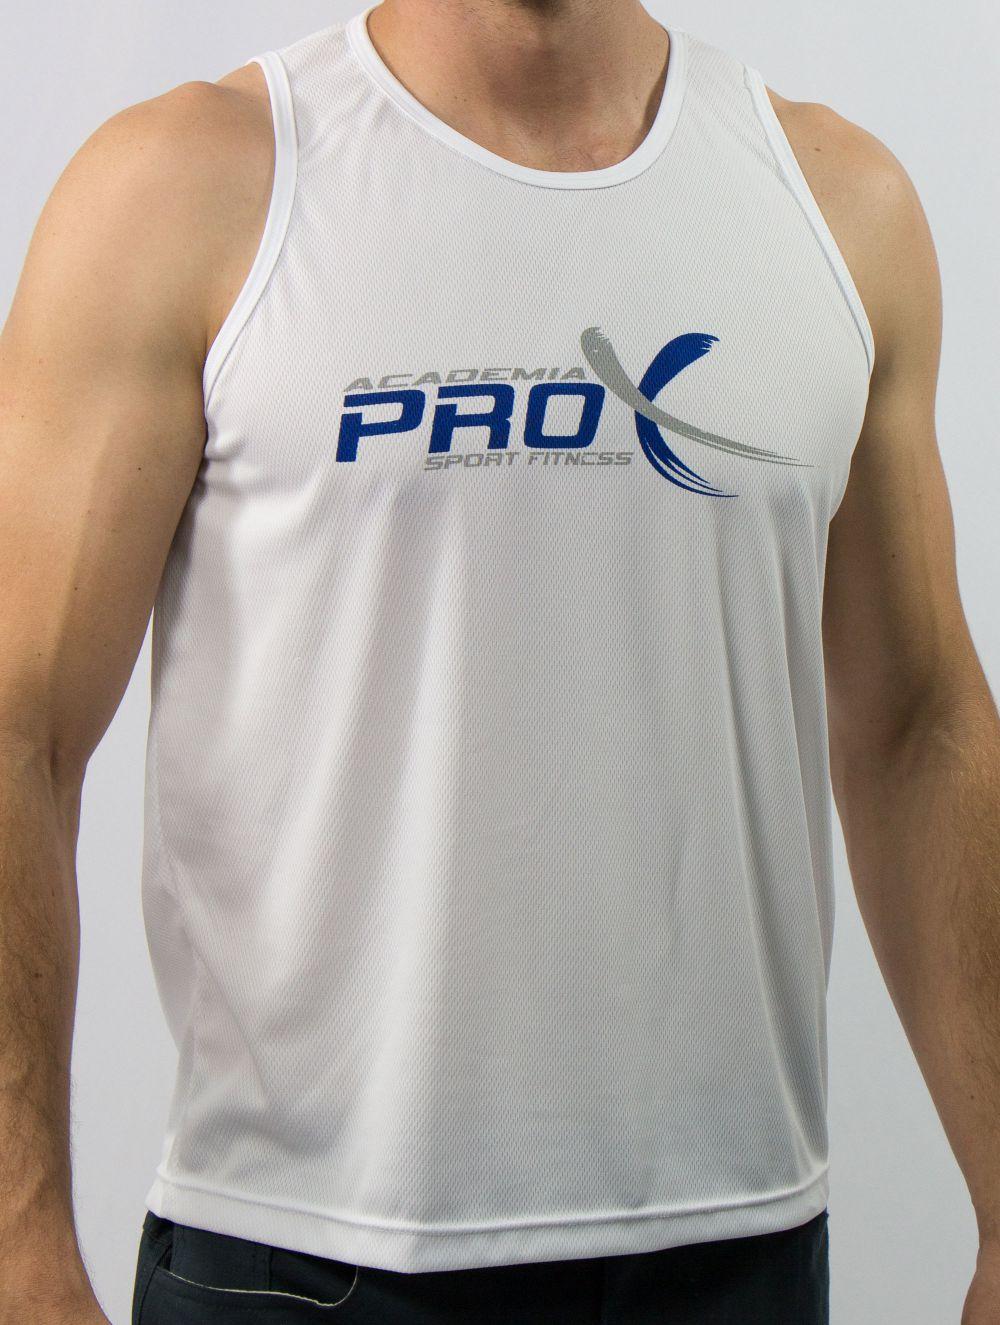 Camiseta Regata em Tecido Dry Fit